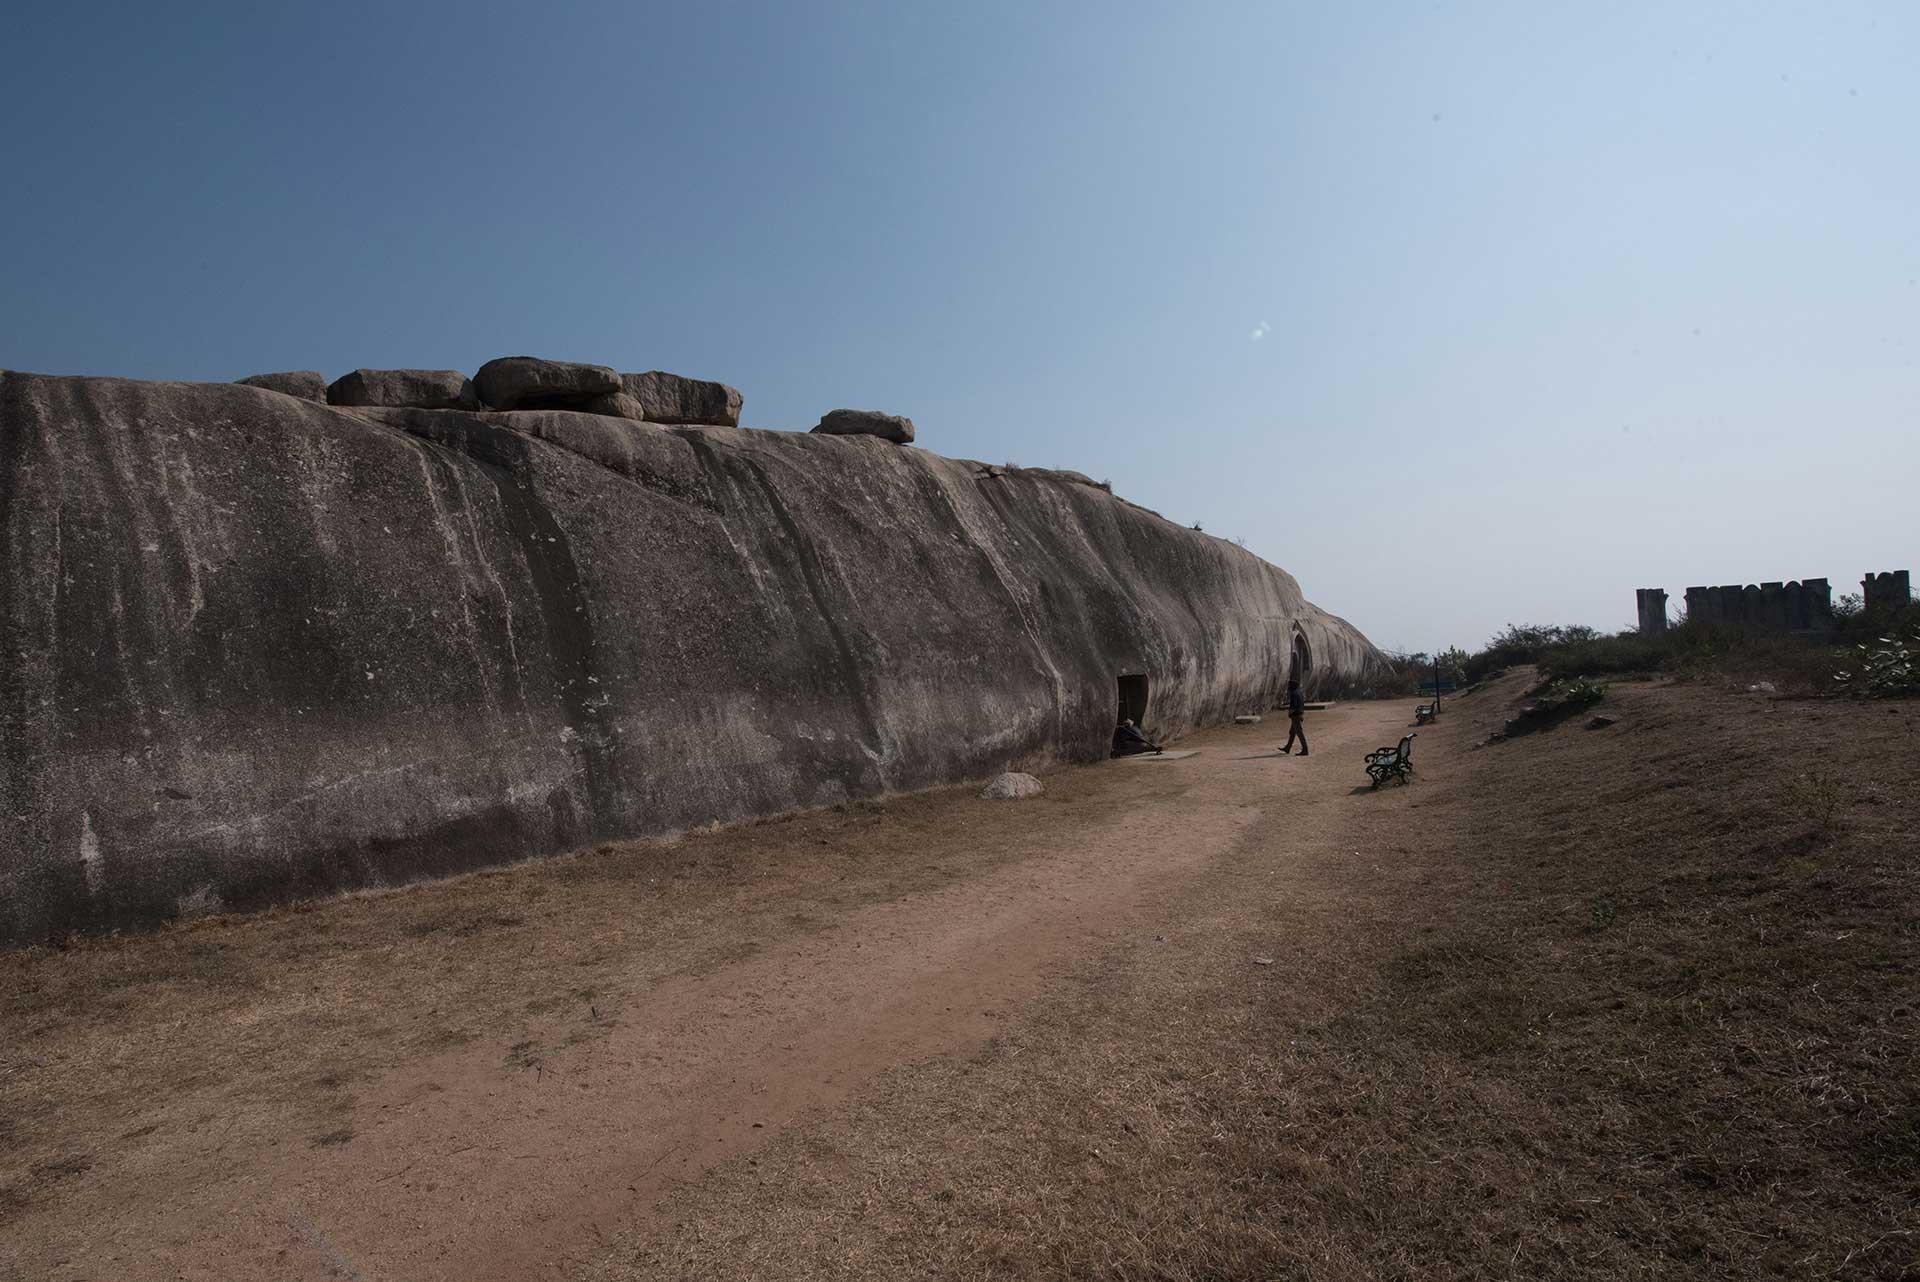 Barabar-BAM-film-granit-miroir-pyramide-inde-yoga-archeologie-baleine-granit